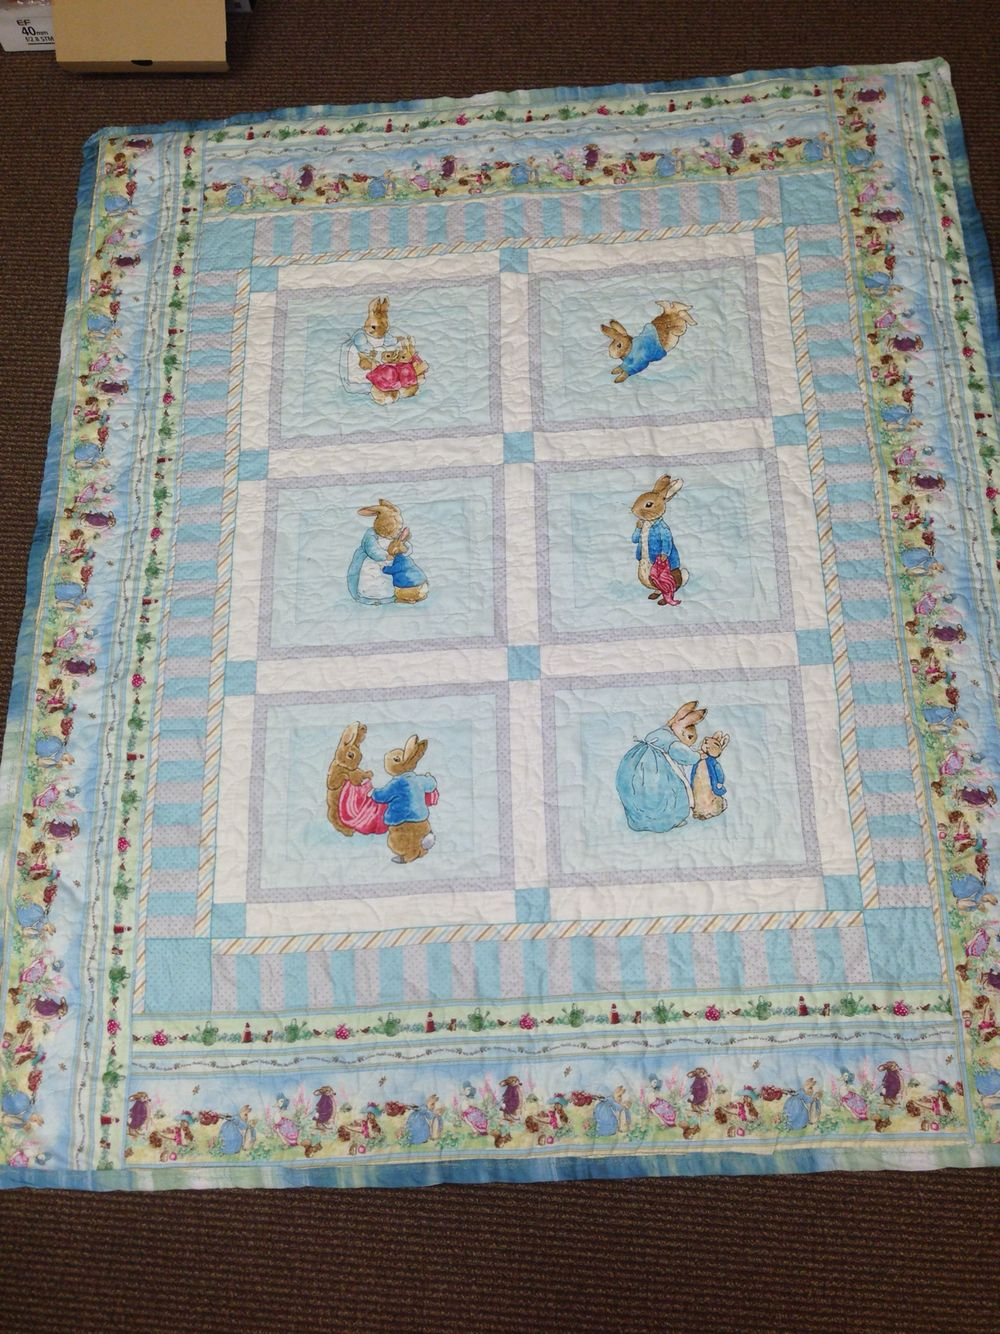 Peter Rabbit baby quilt with minky backing   Quilts   Pinterest ... : peter rabbit baby quilt - Adamdwight.com